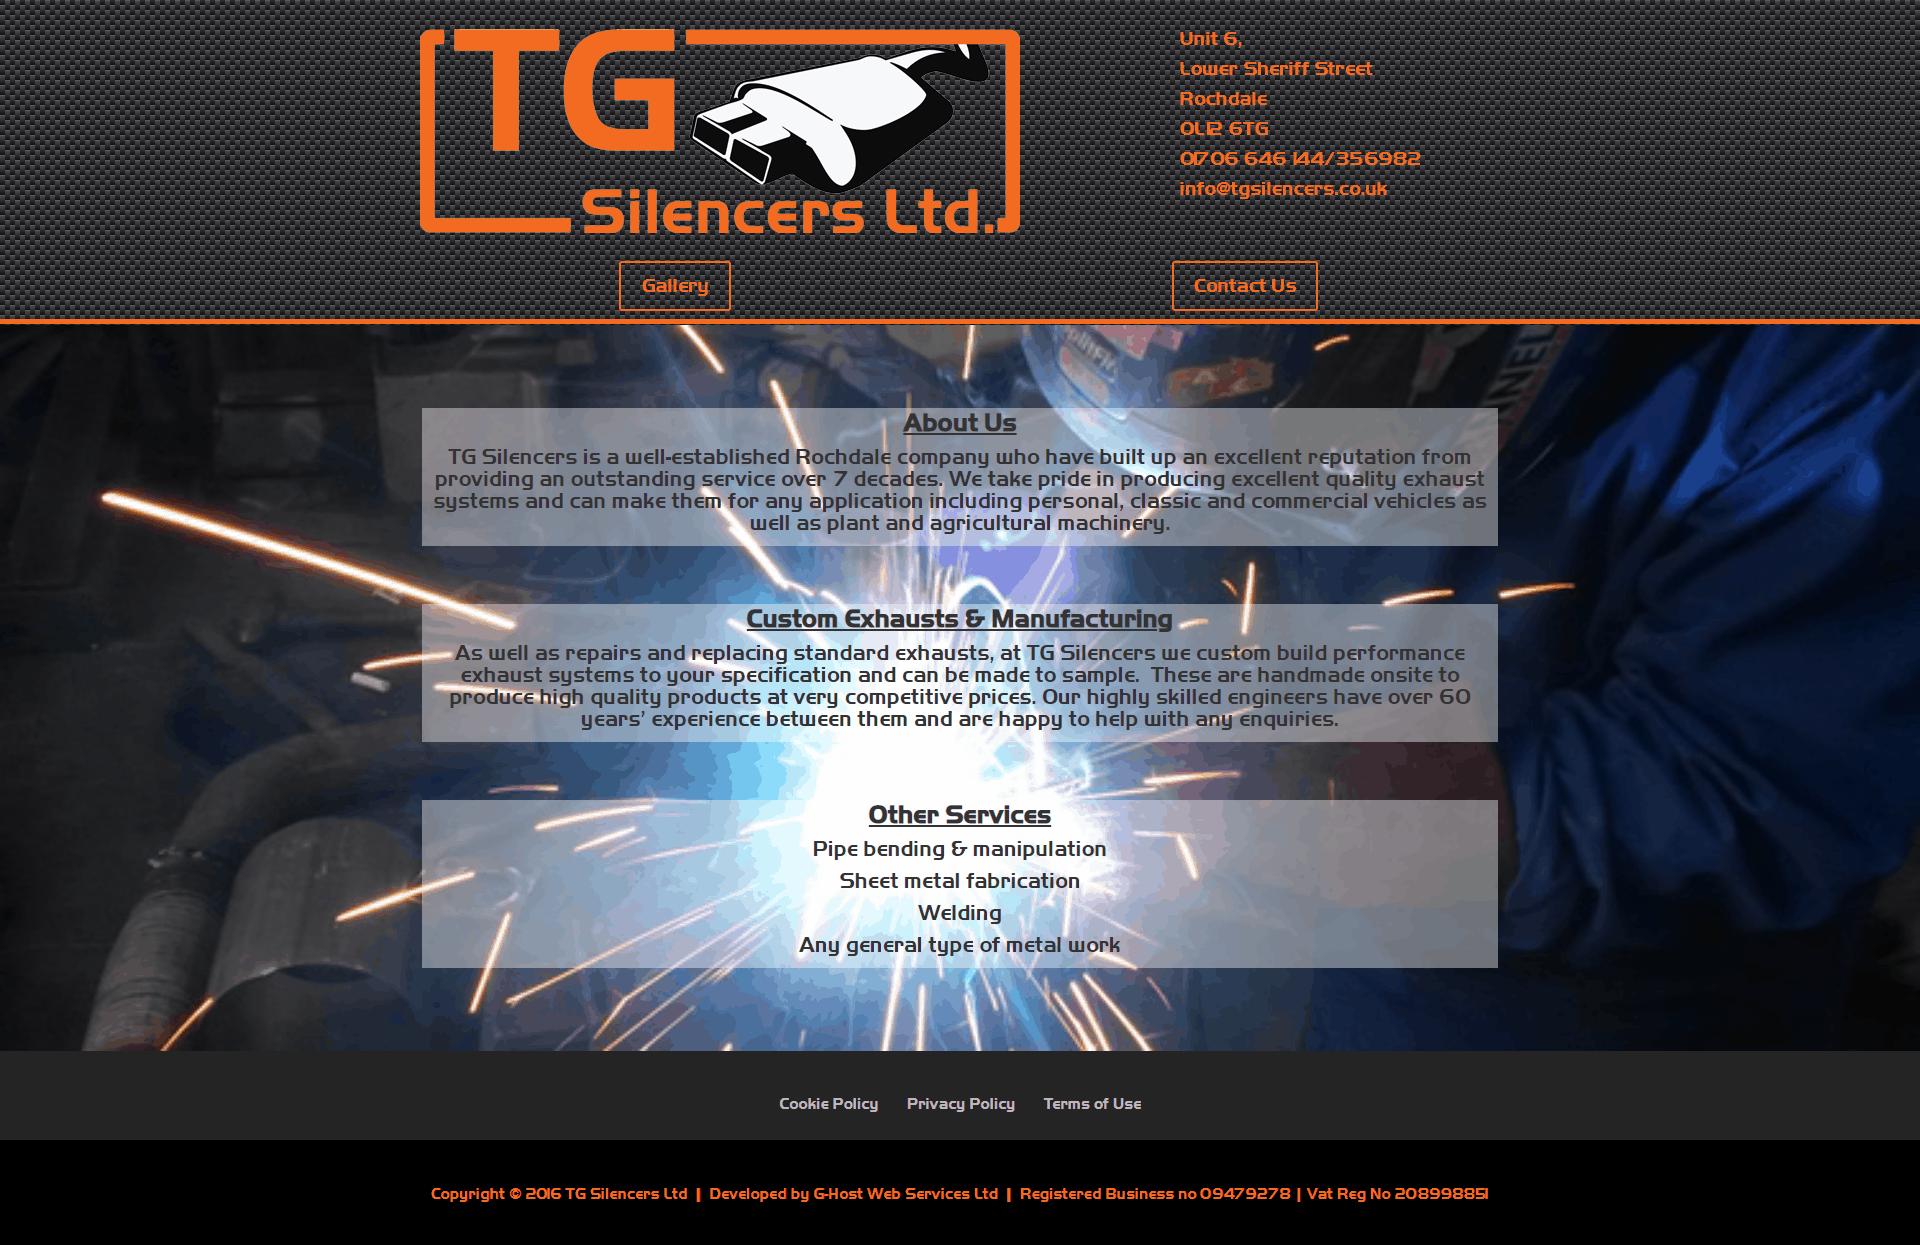 TG Silencers